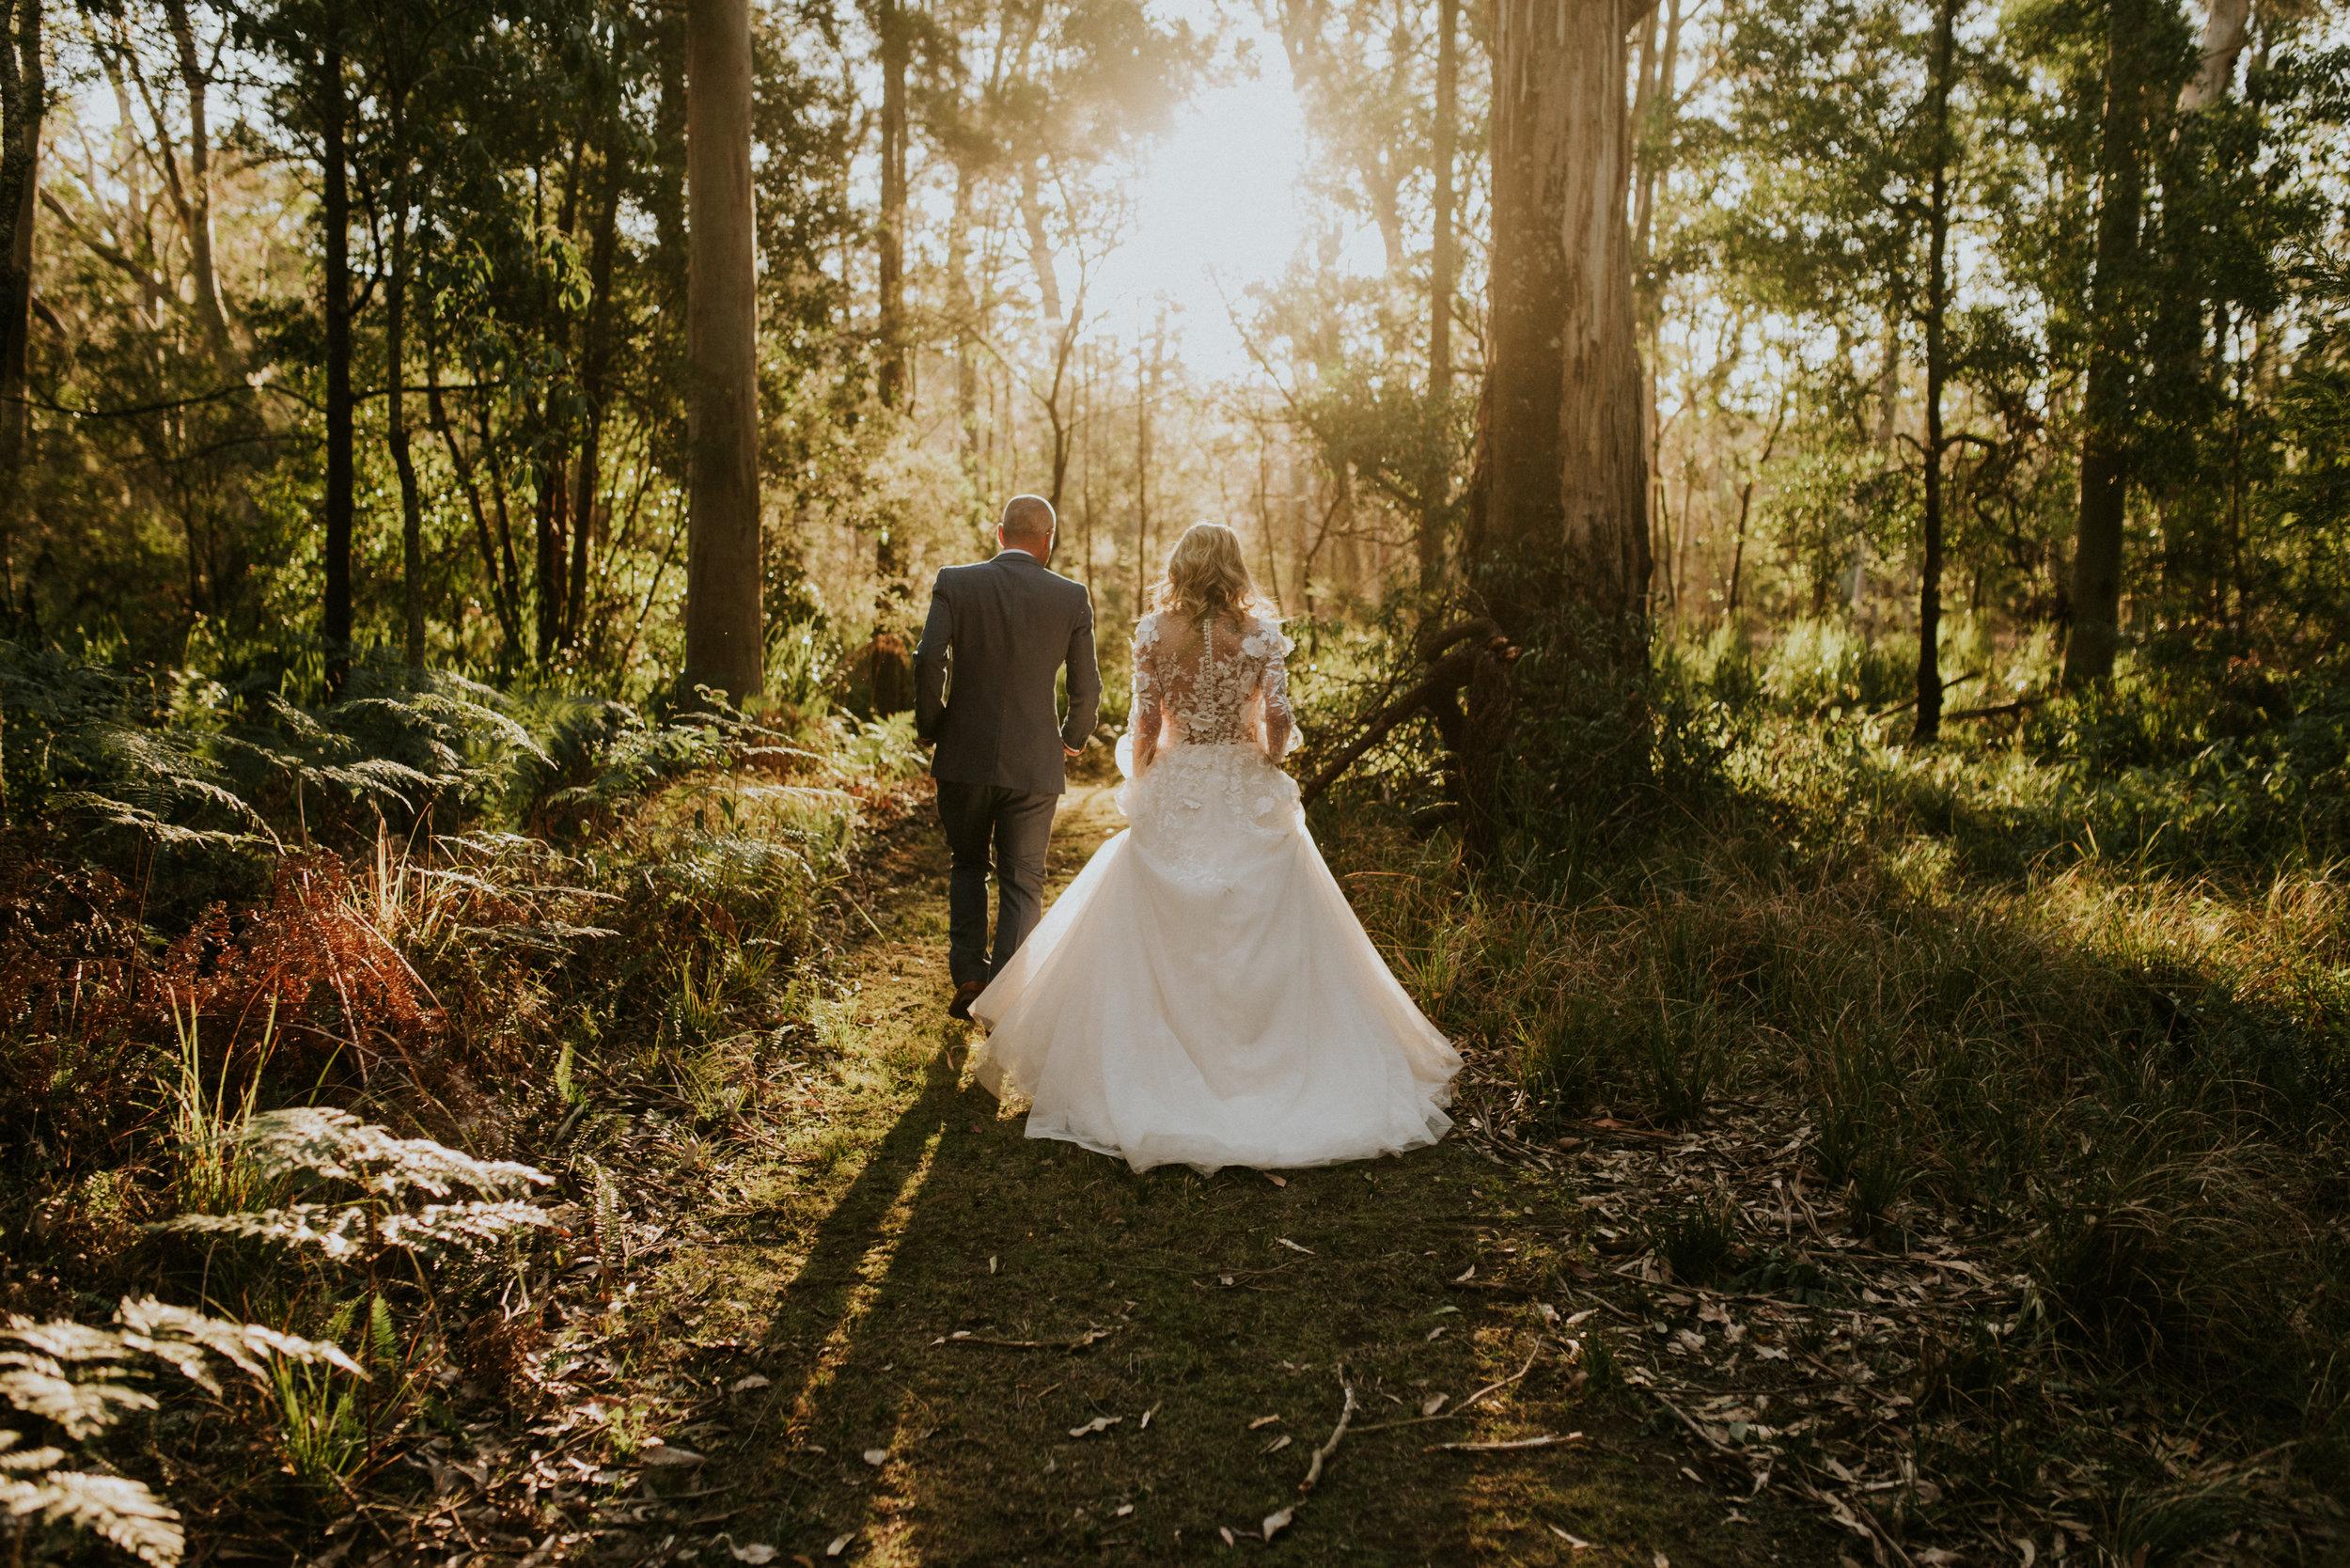 Tiara & Scott - Bewong River Retreat Wedding     5th August 2018